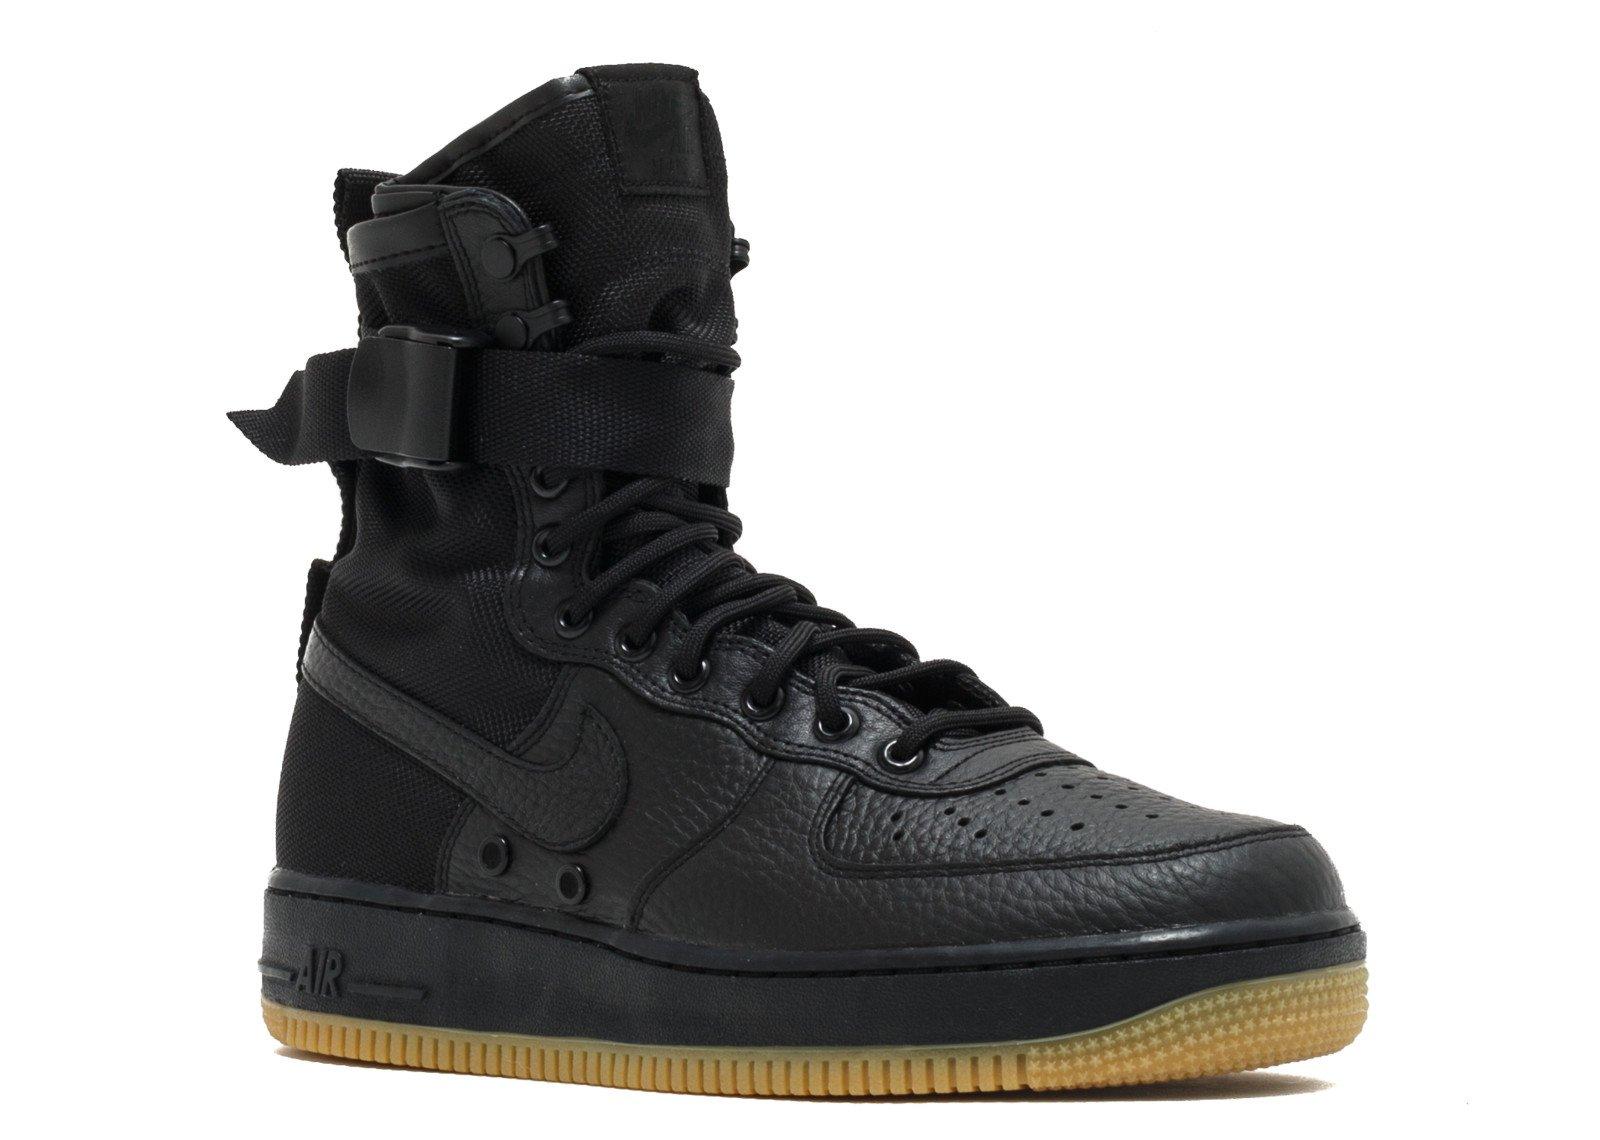 premium selection c12a9 29828 Nike SF AF1 - 864024 001